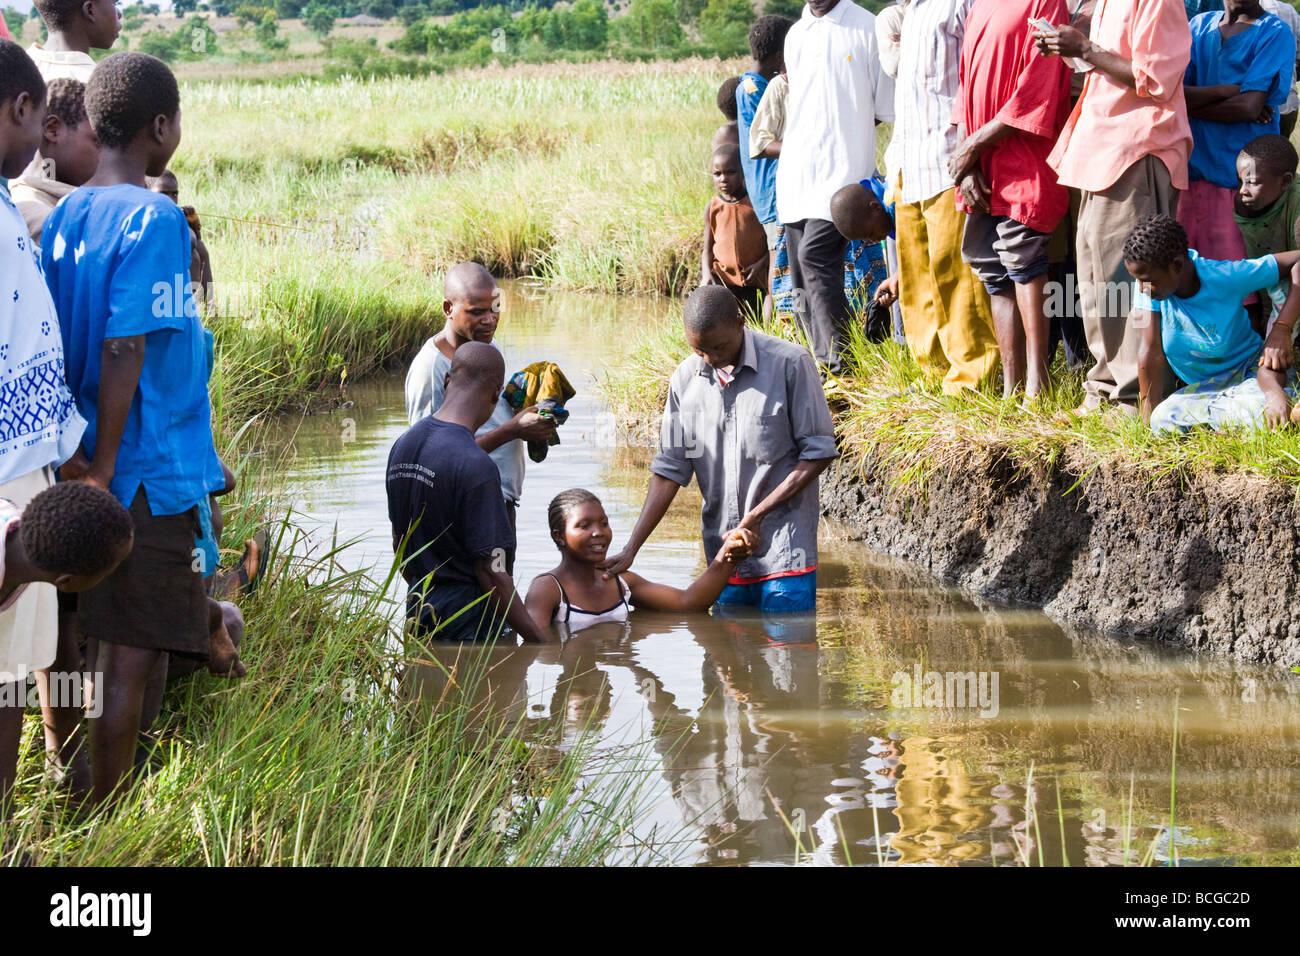 Christian malawi